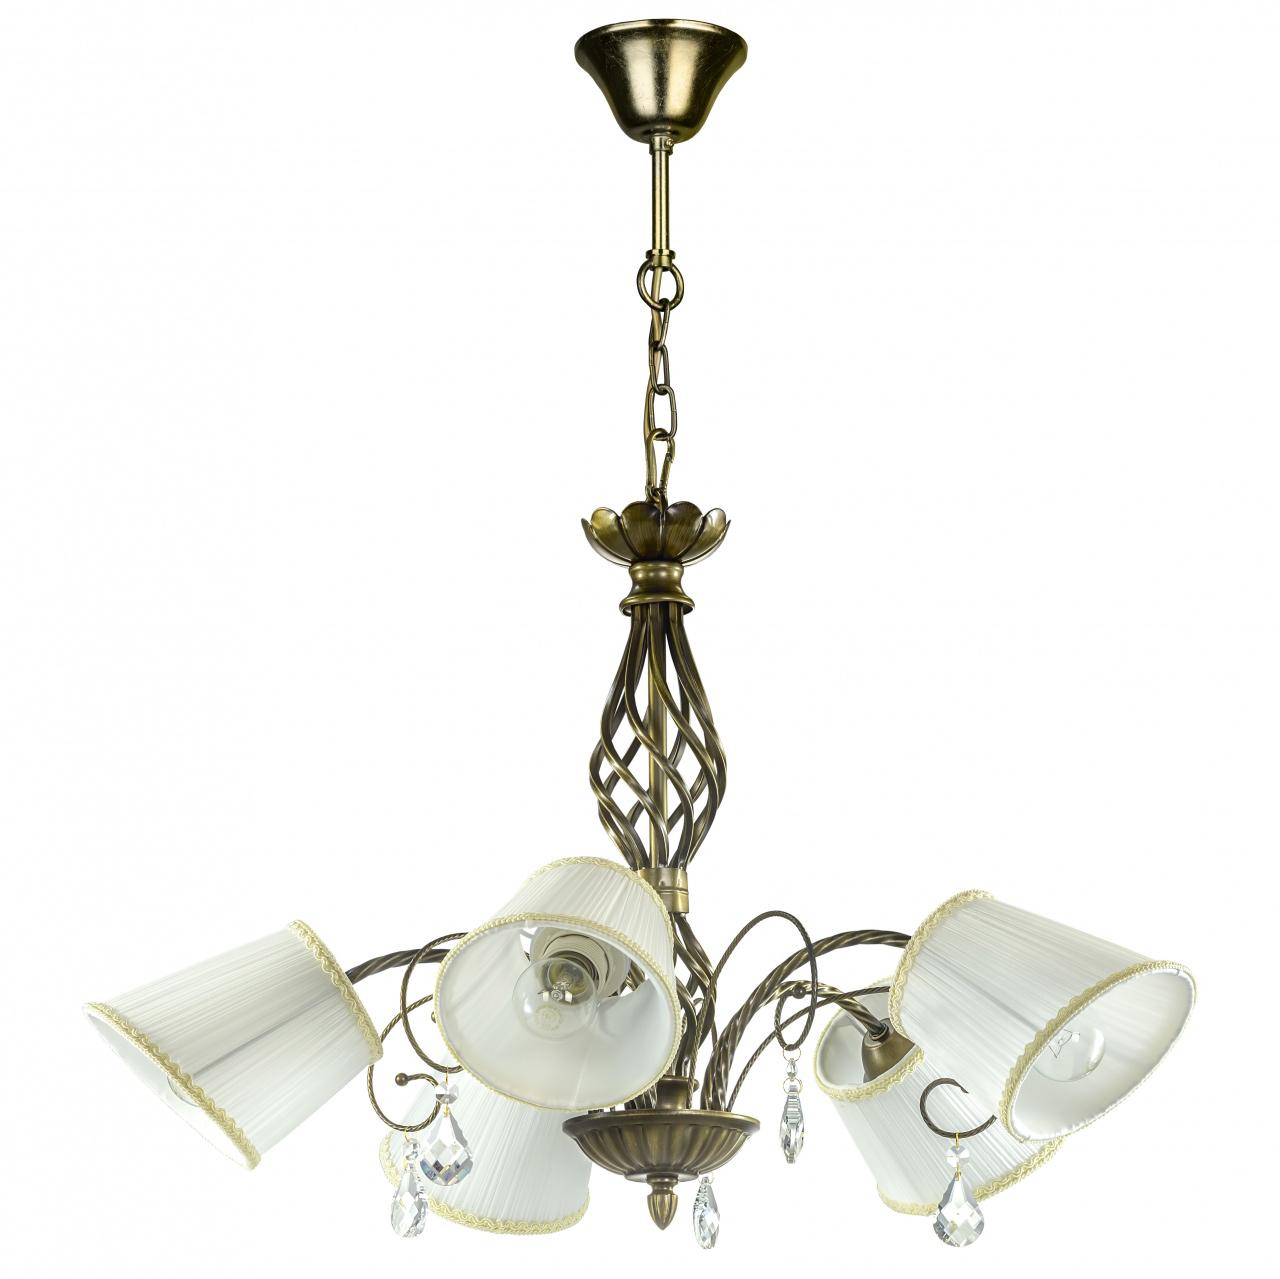 Люстра подвесная Esedra 5x40W E27 bronze ткань Lightstar 796151